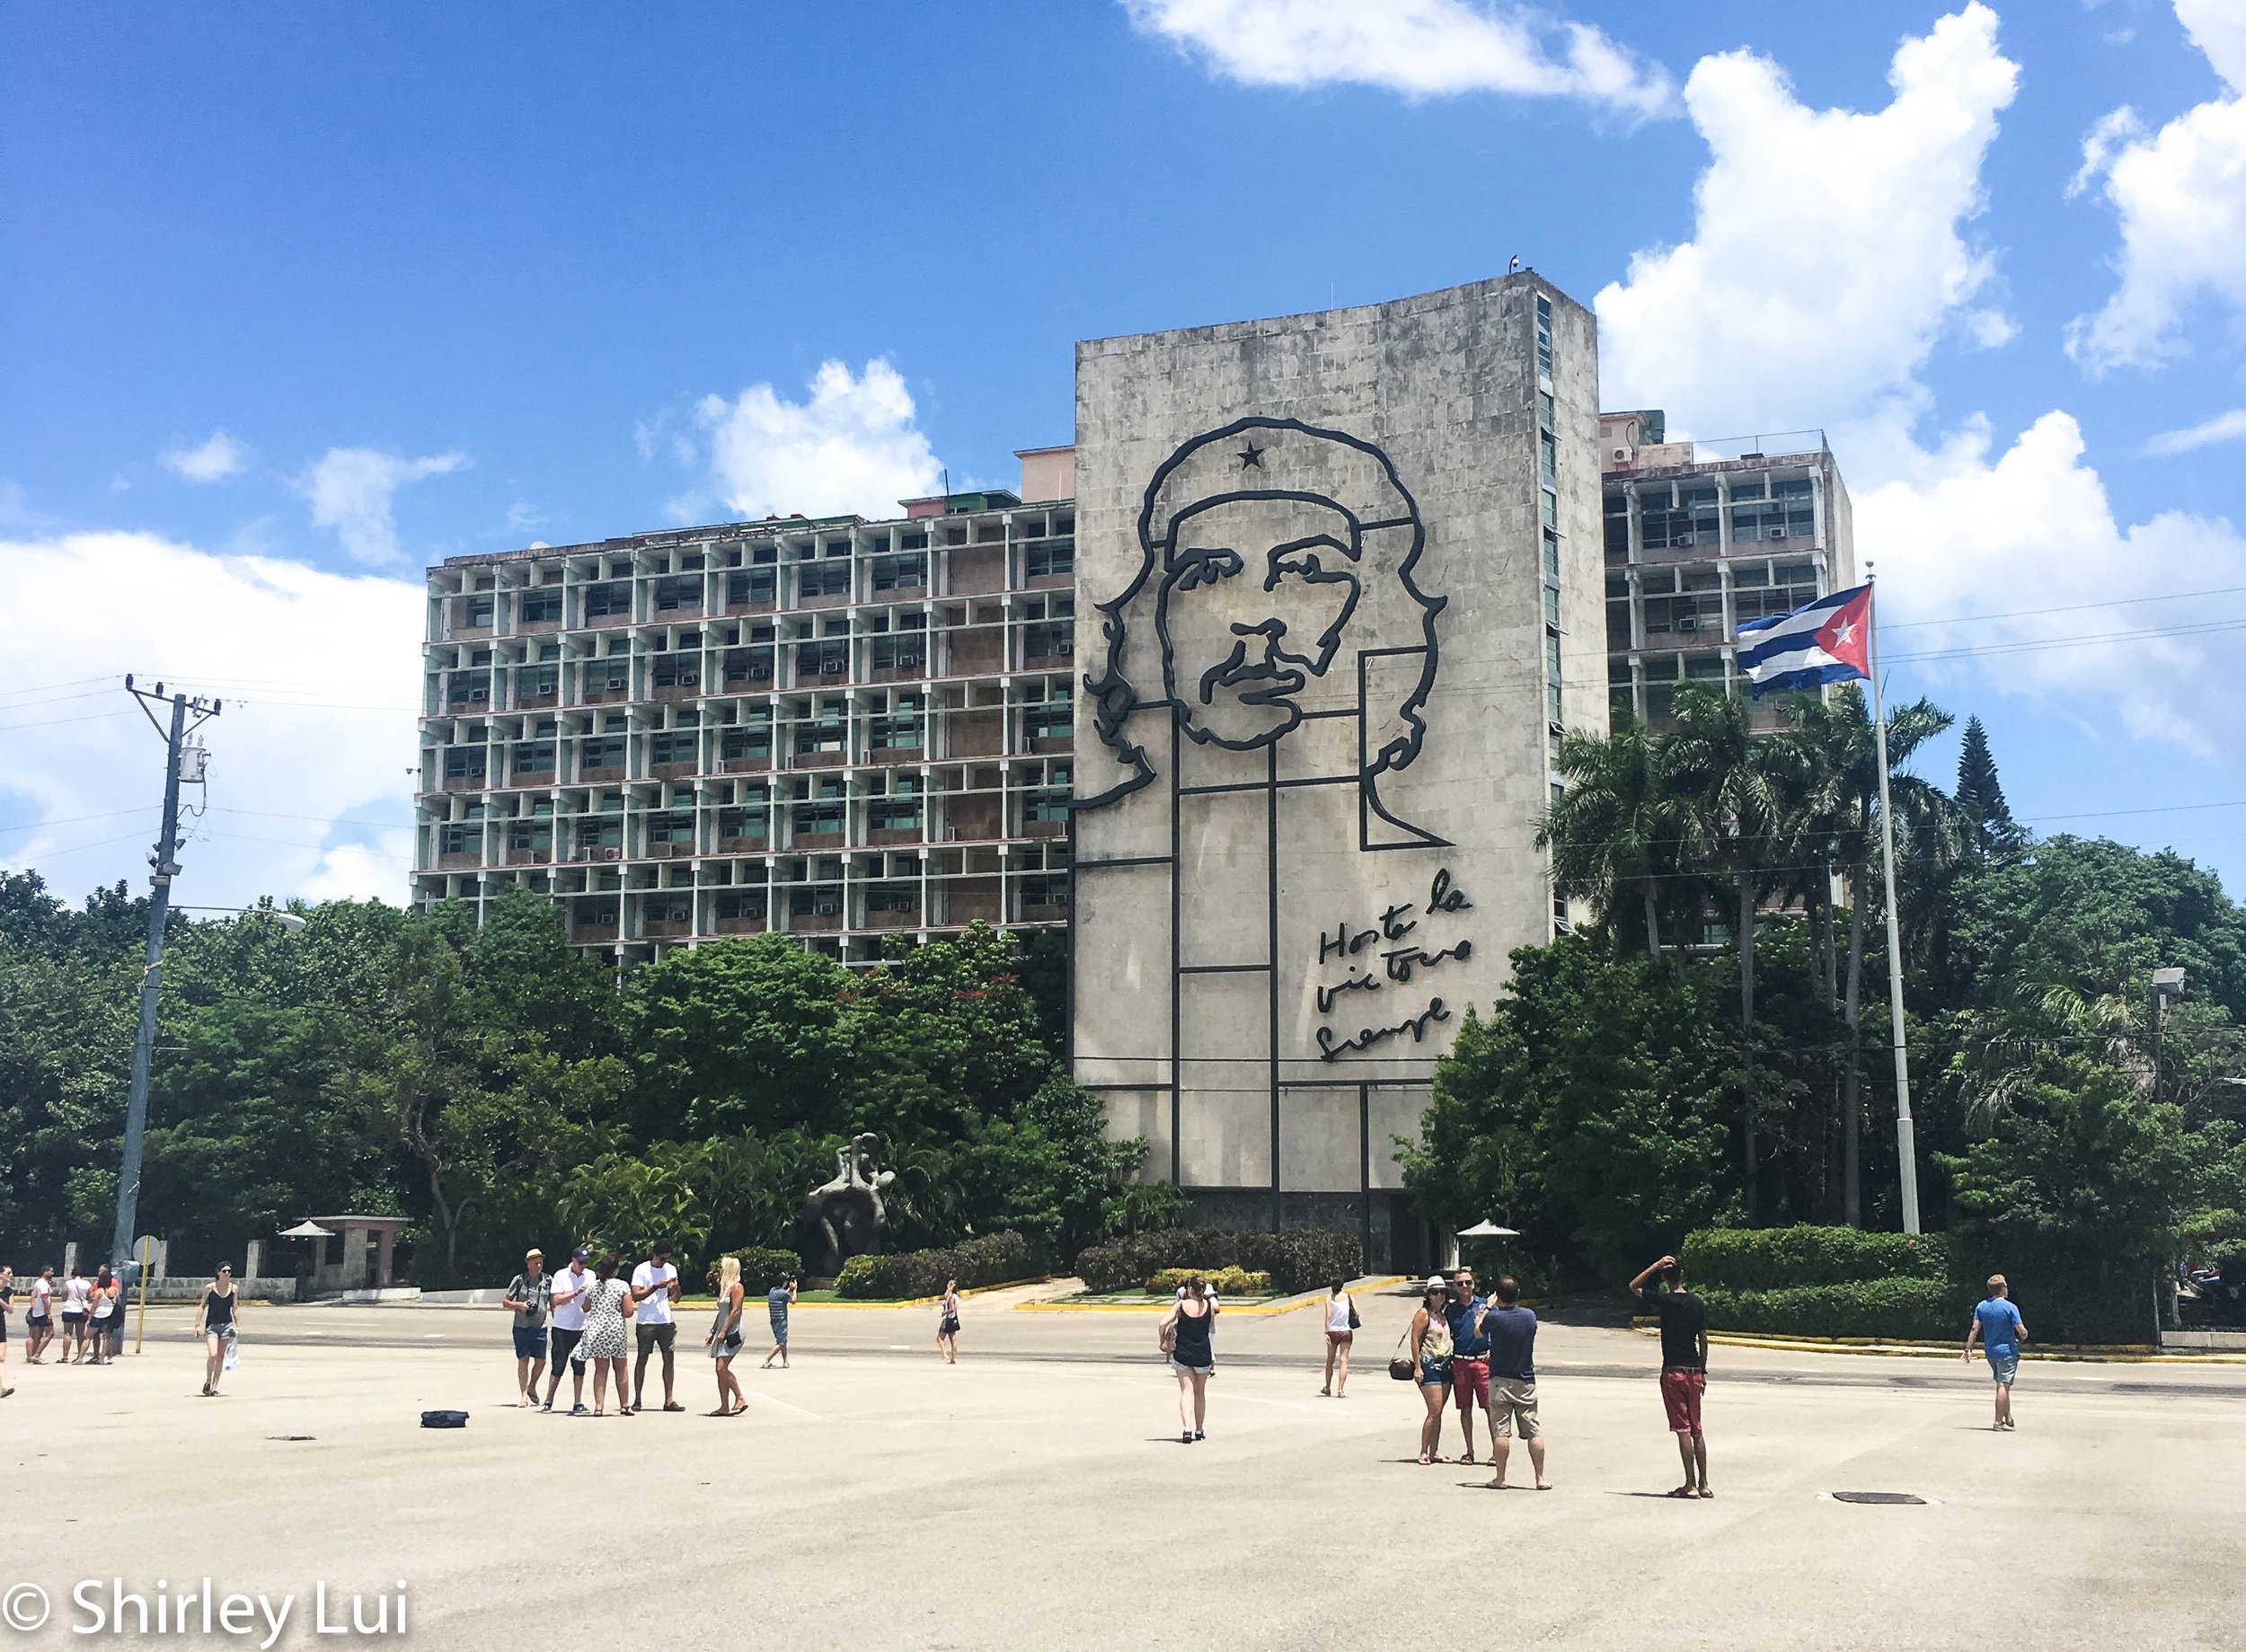 Steel memorial of revolutionist Che Guevara at Revolution Square in Havana, Cuba.